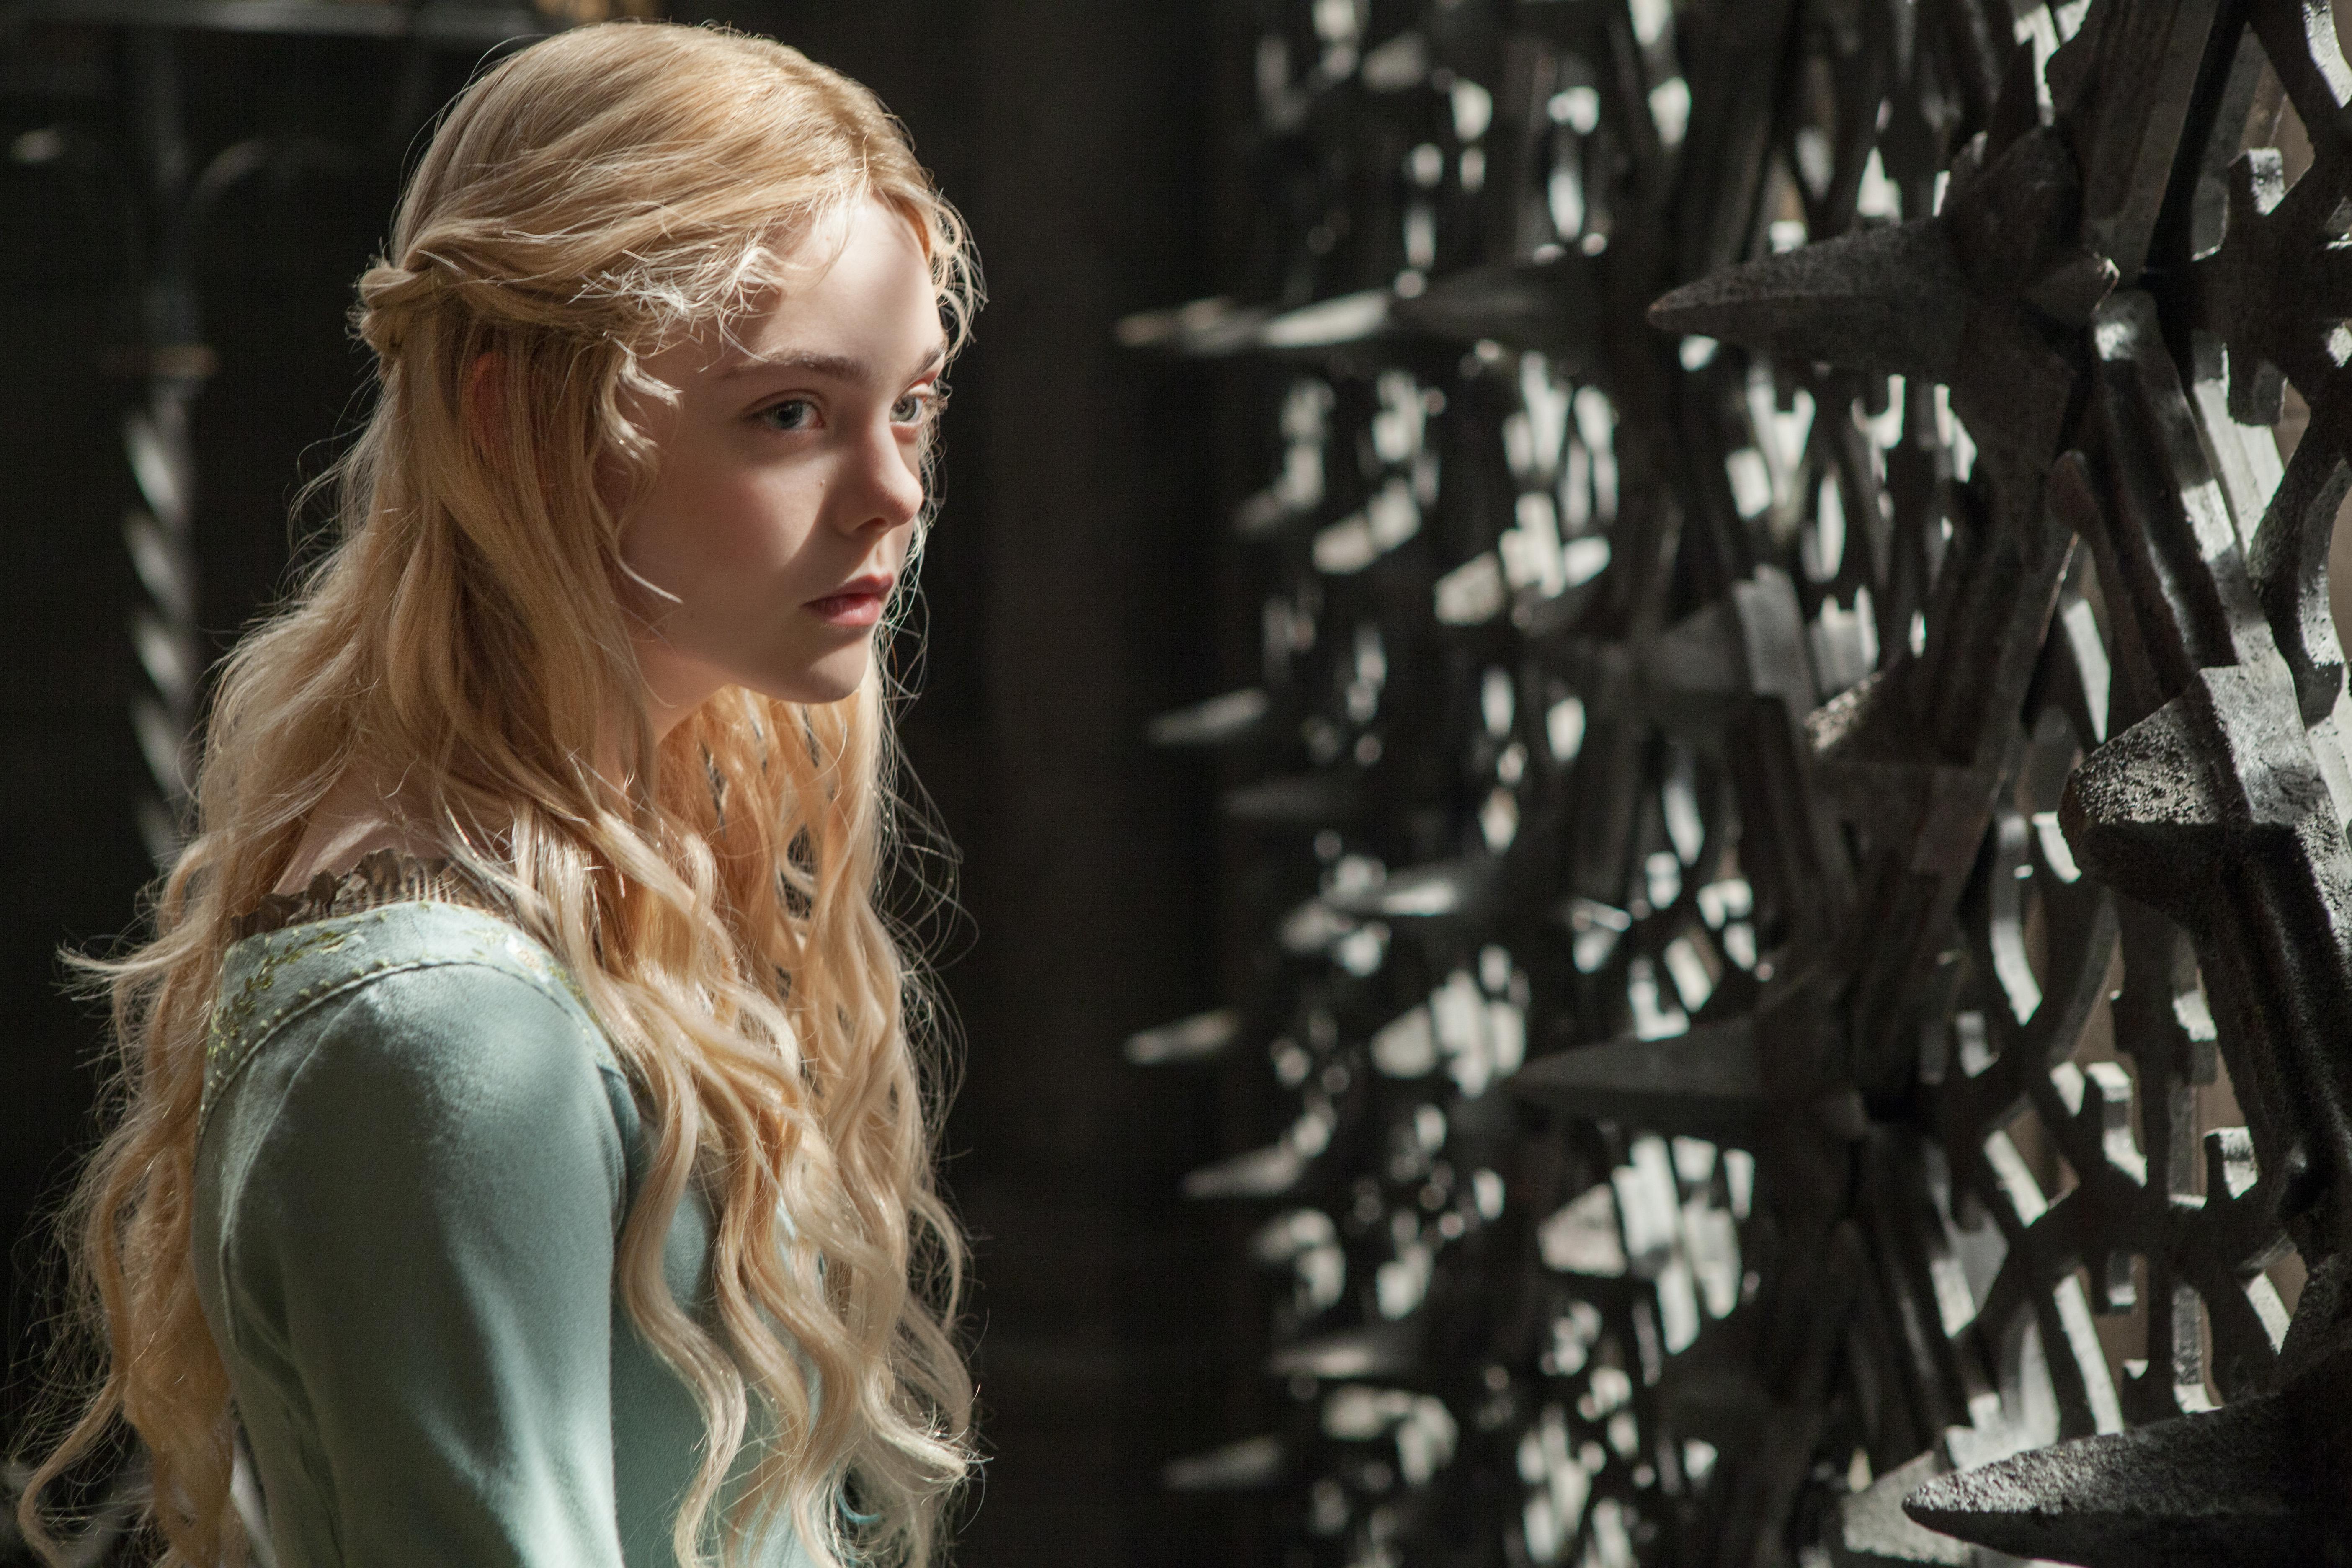 princesa aurora malefica elle fanning